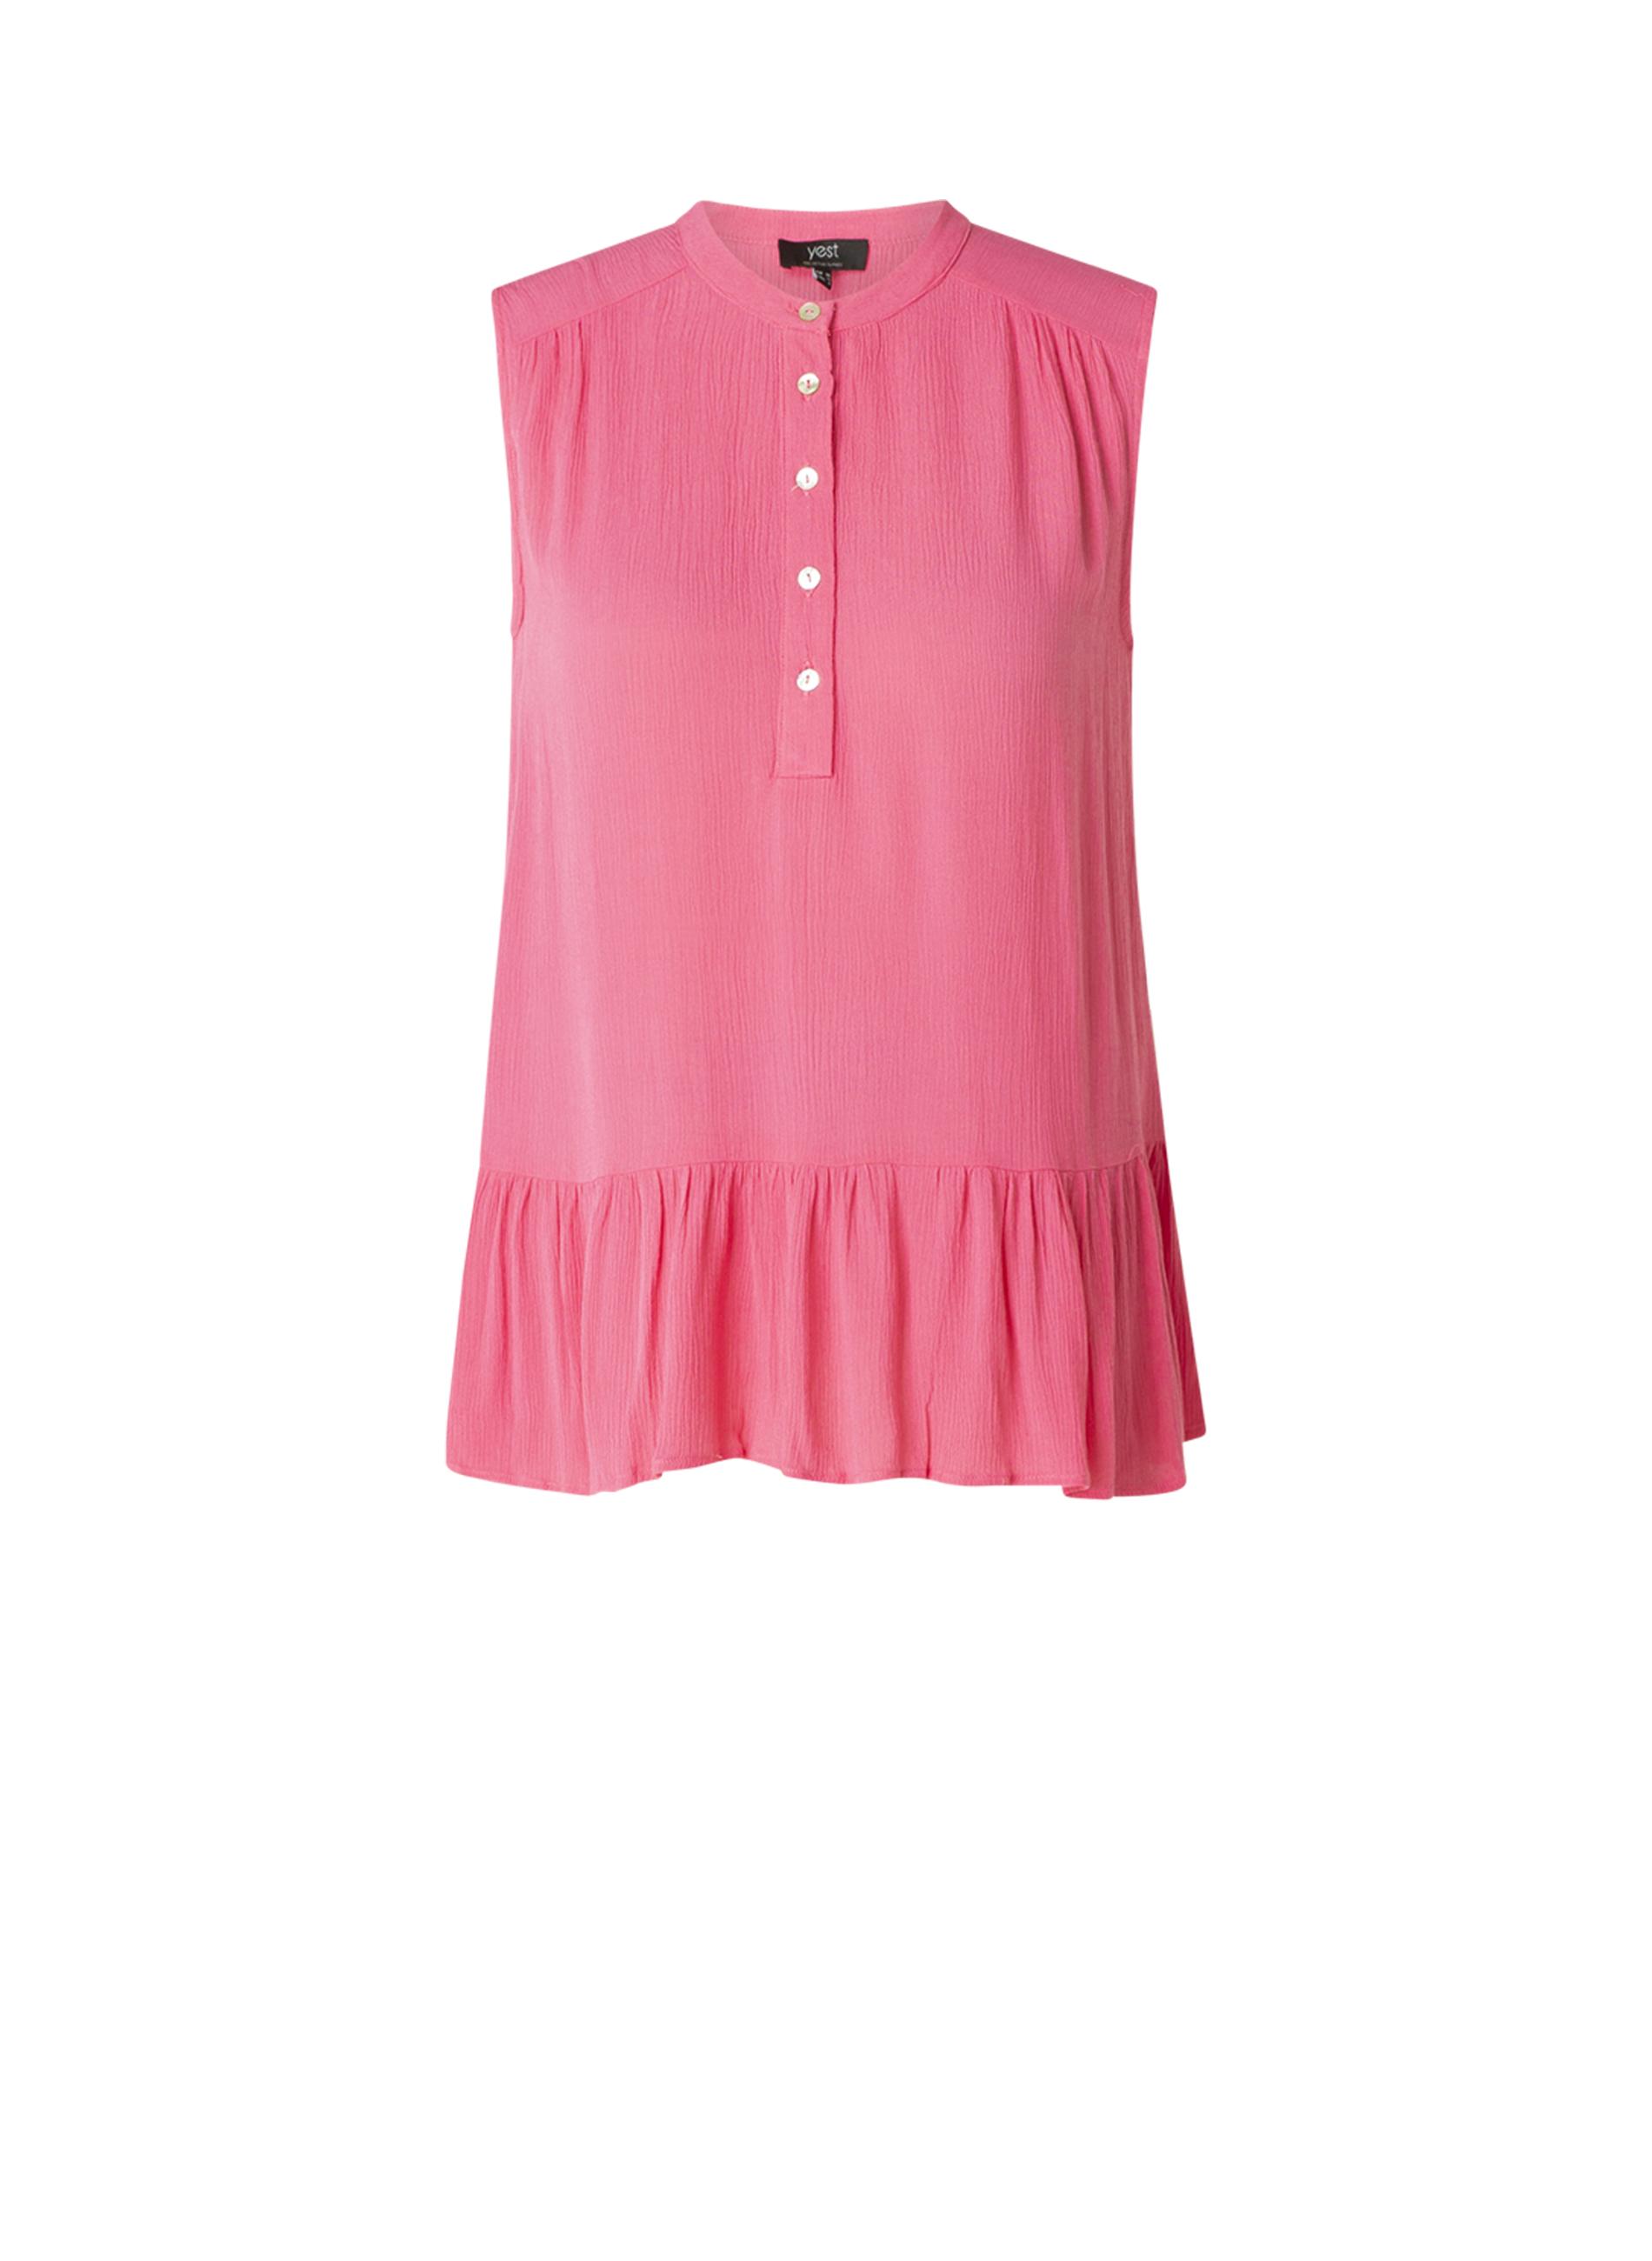 Yesta shirt Leticia 70 cm